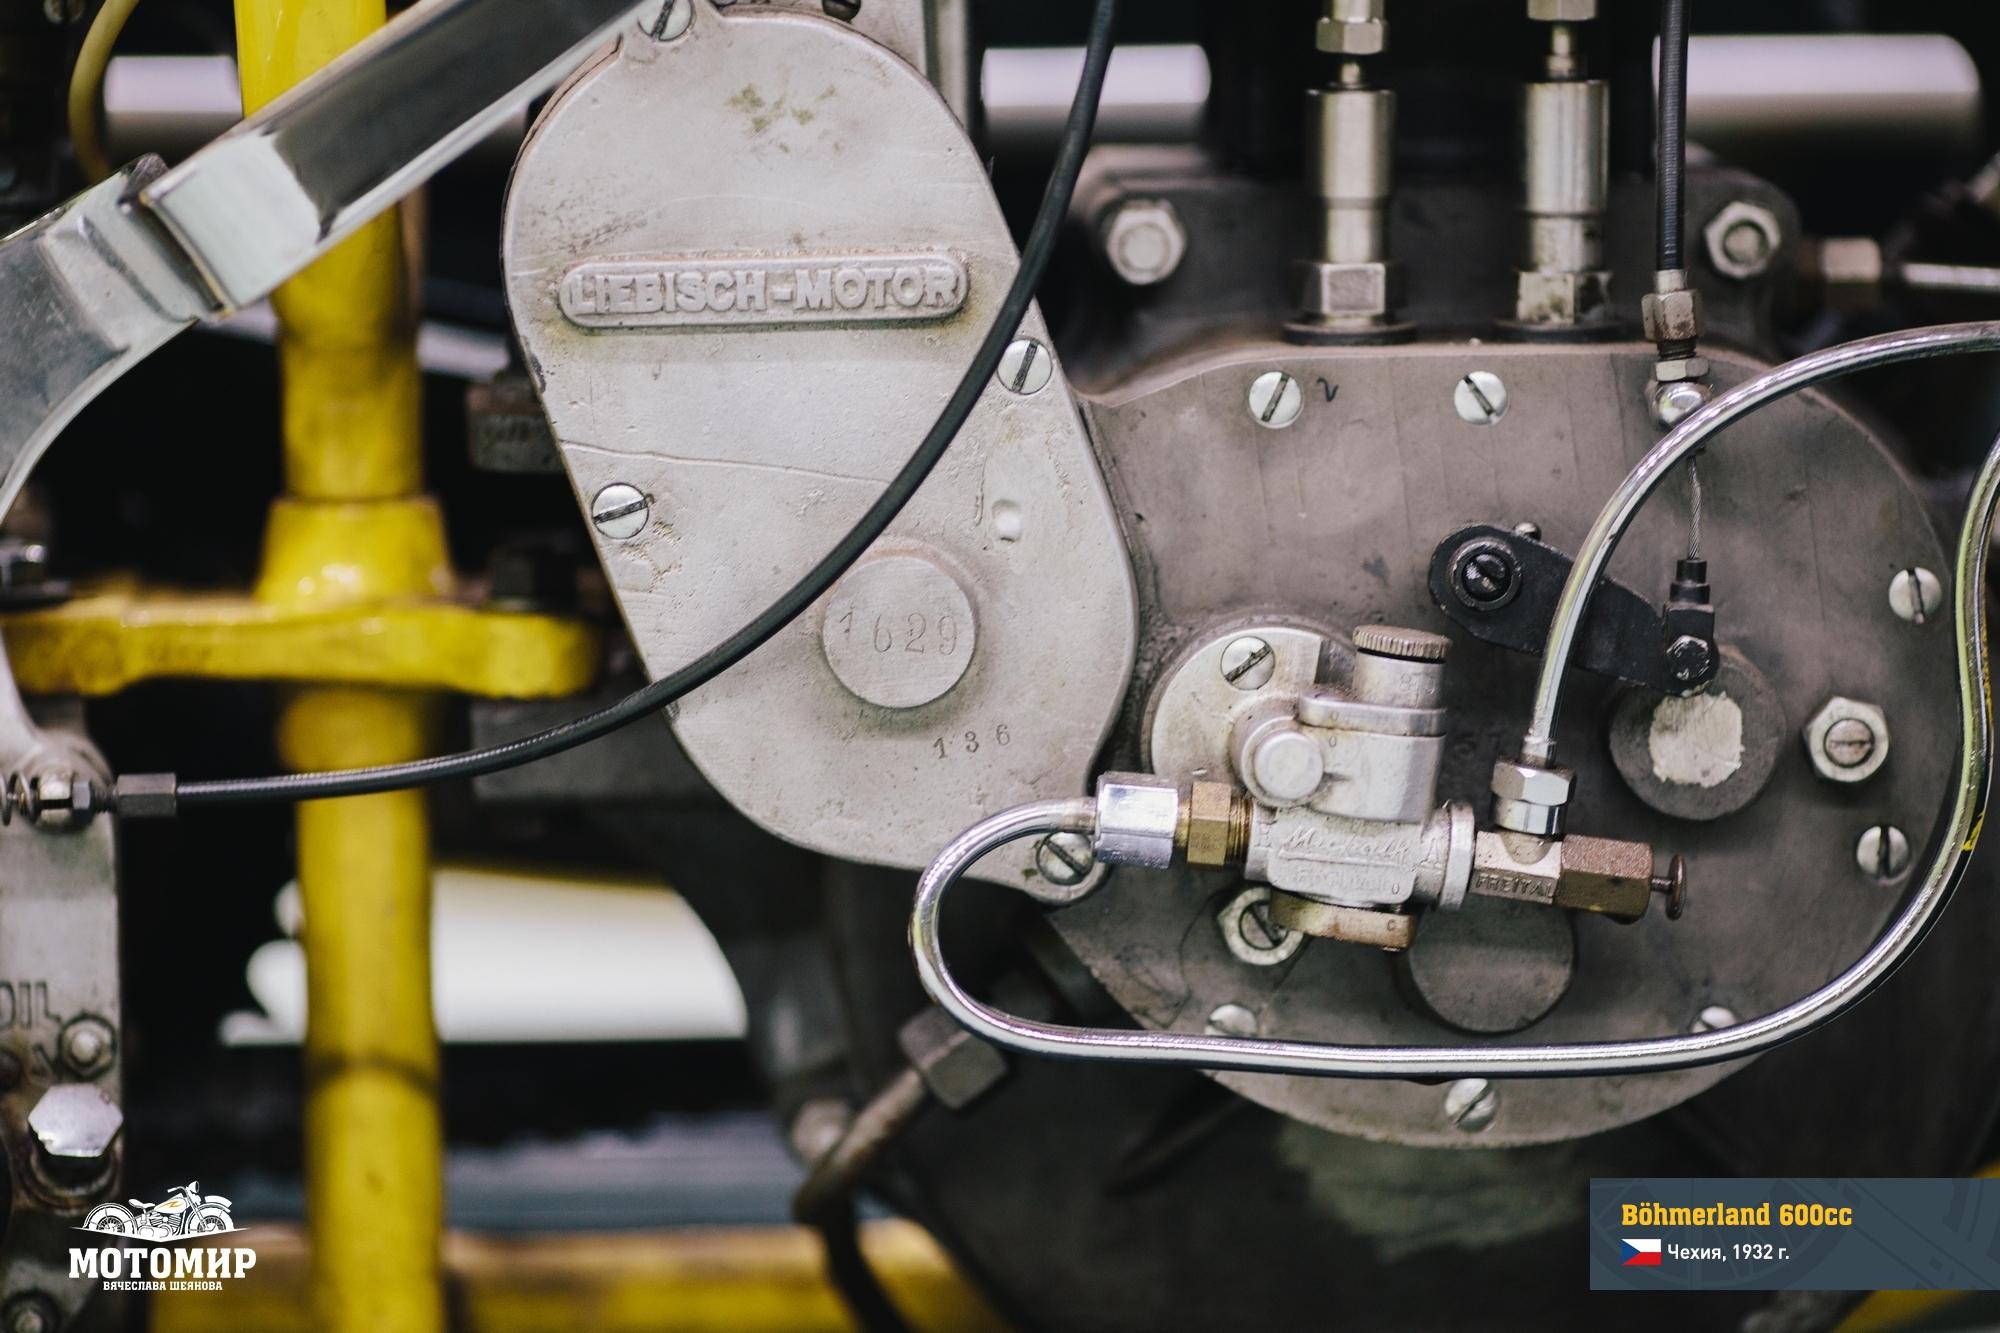 bohmerland-600cc-201502-web-12